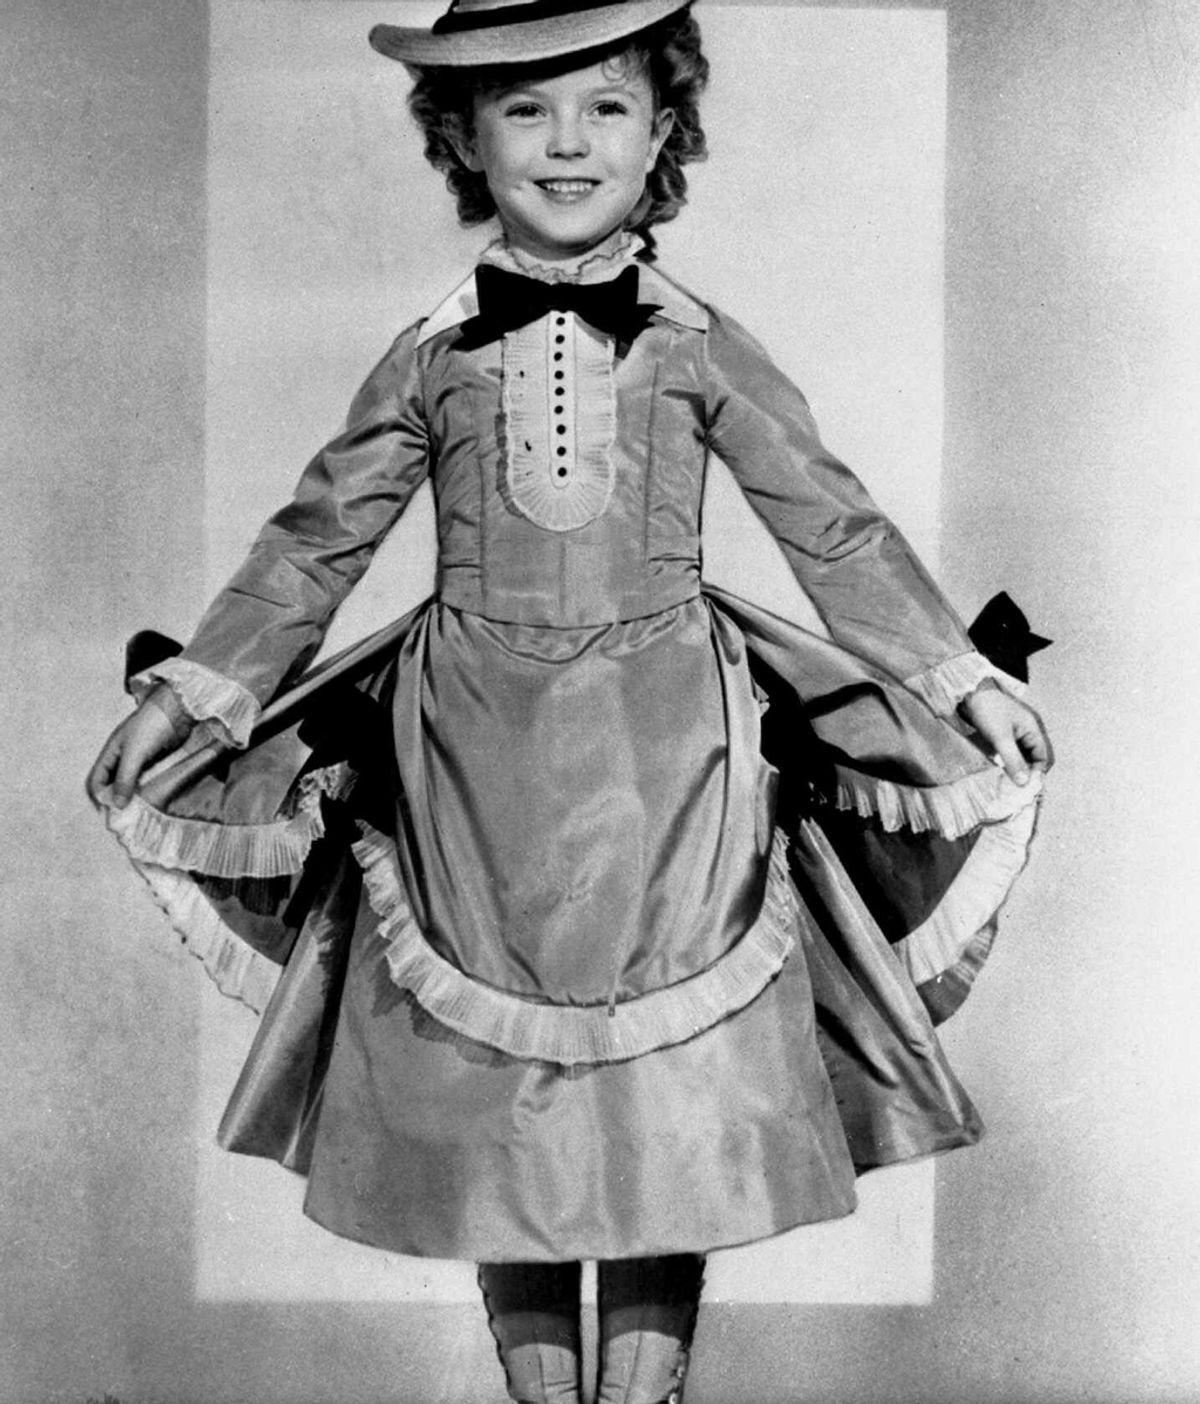 Shirley Temple en un fotograma de la película The Little Colonel